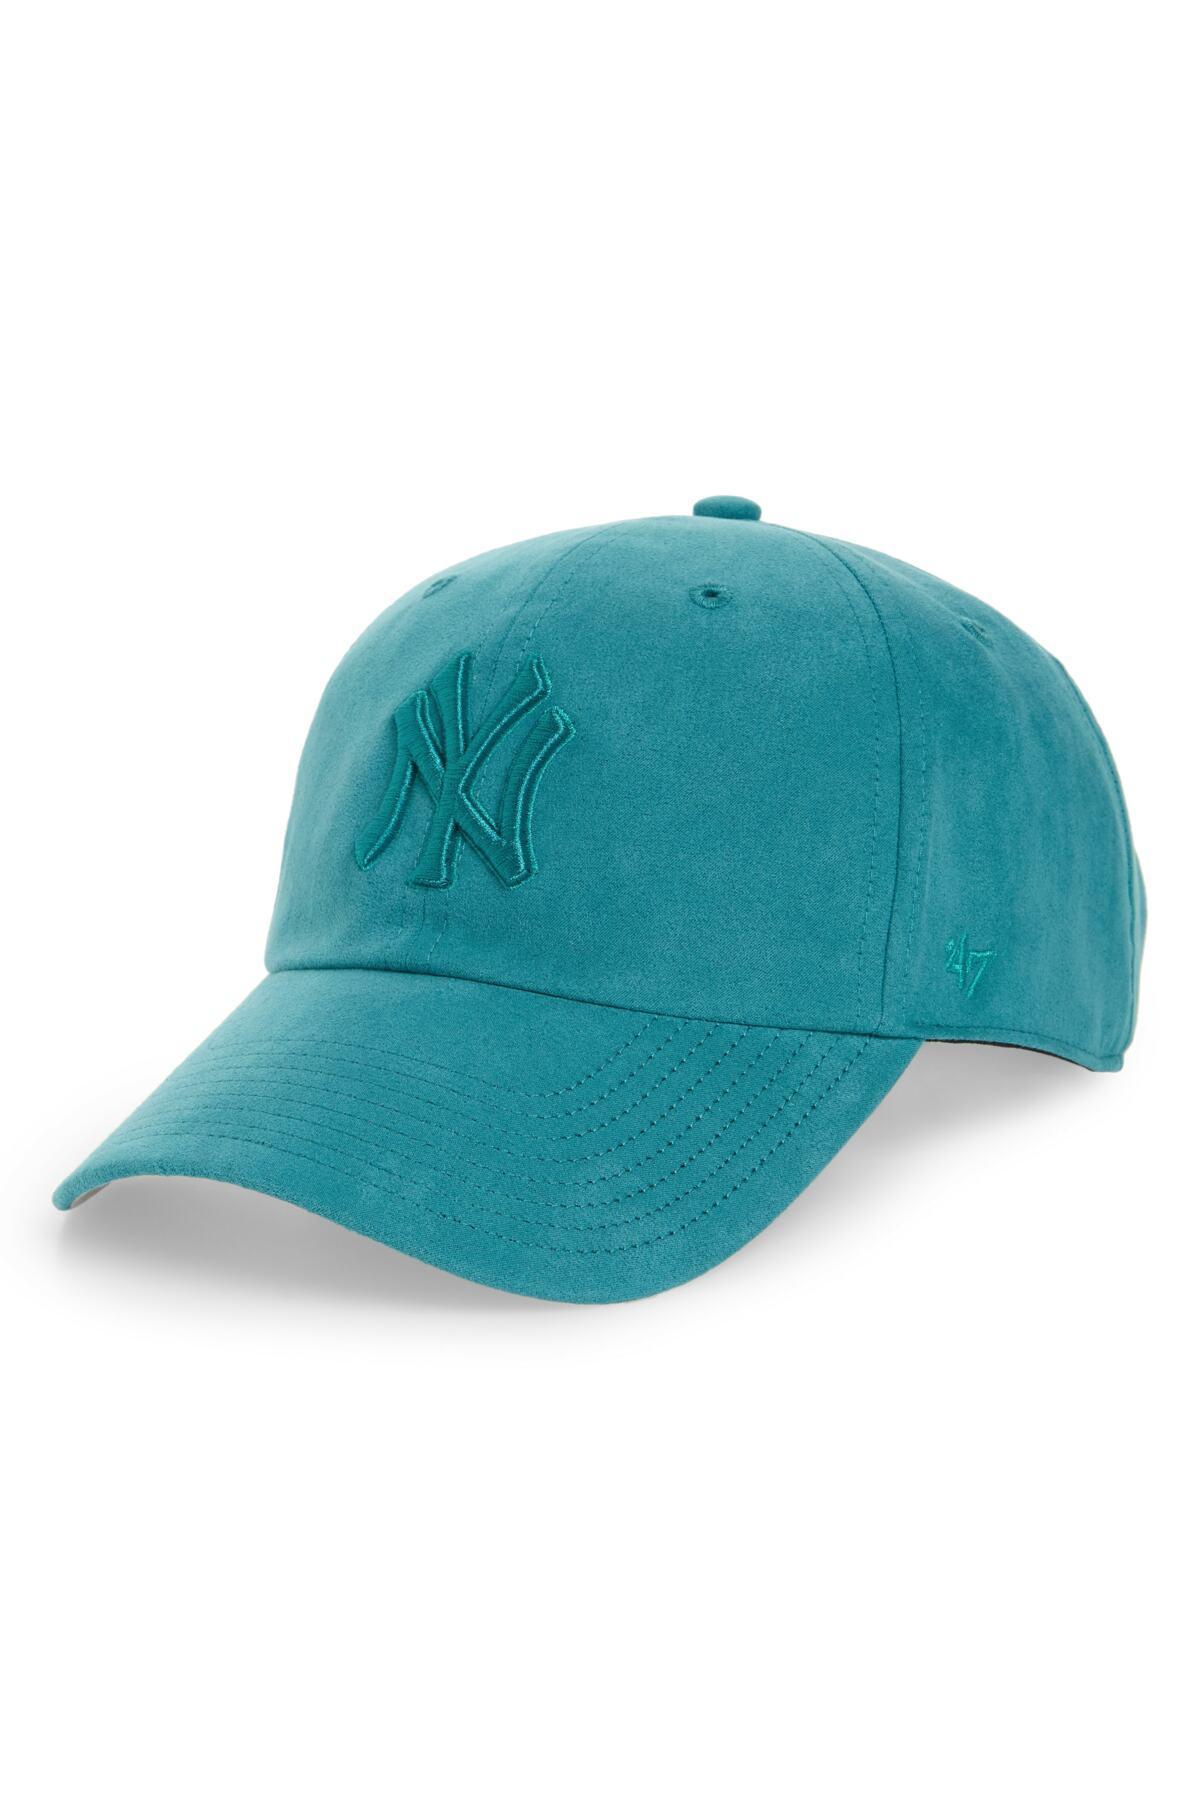 competitive price 6b449 9a45b ... clearance 47 brand. womens blue ultrabasic clean up new york yankees baseball  cap f2557 53afc